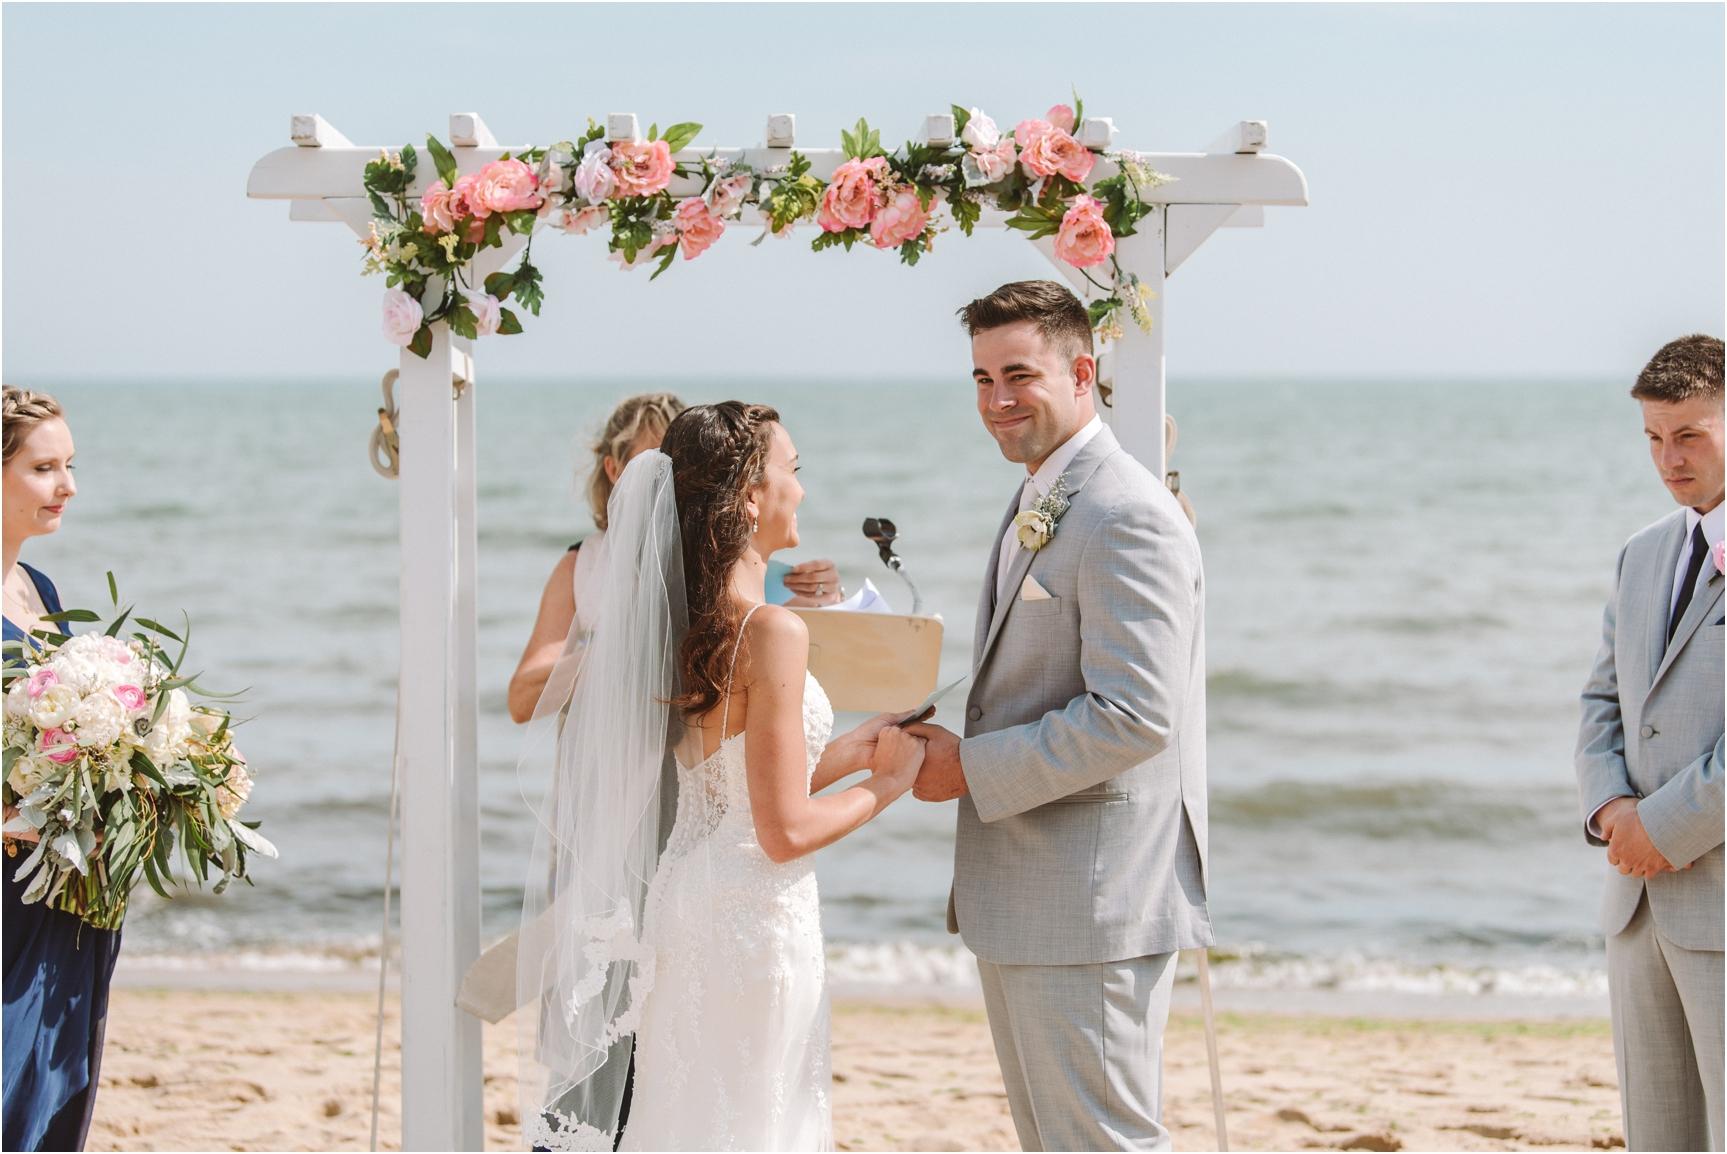 Sarah & Sam Pelham House Cape Cod Wedding Photographer-101.jpg